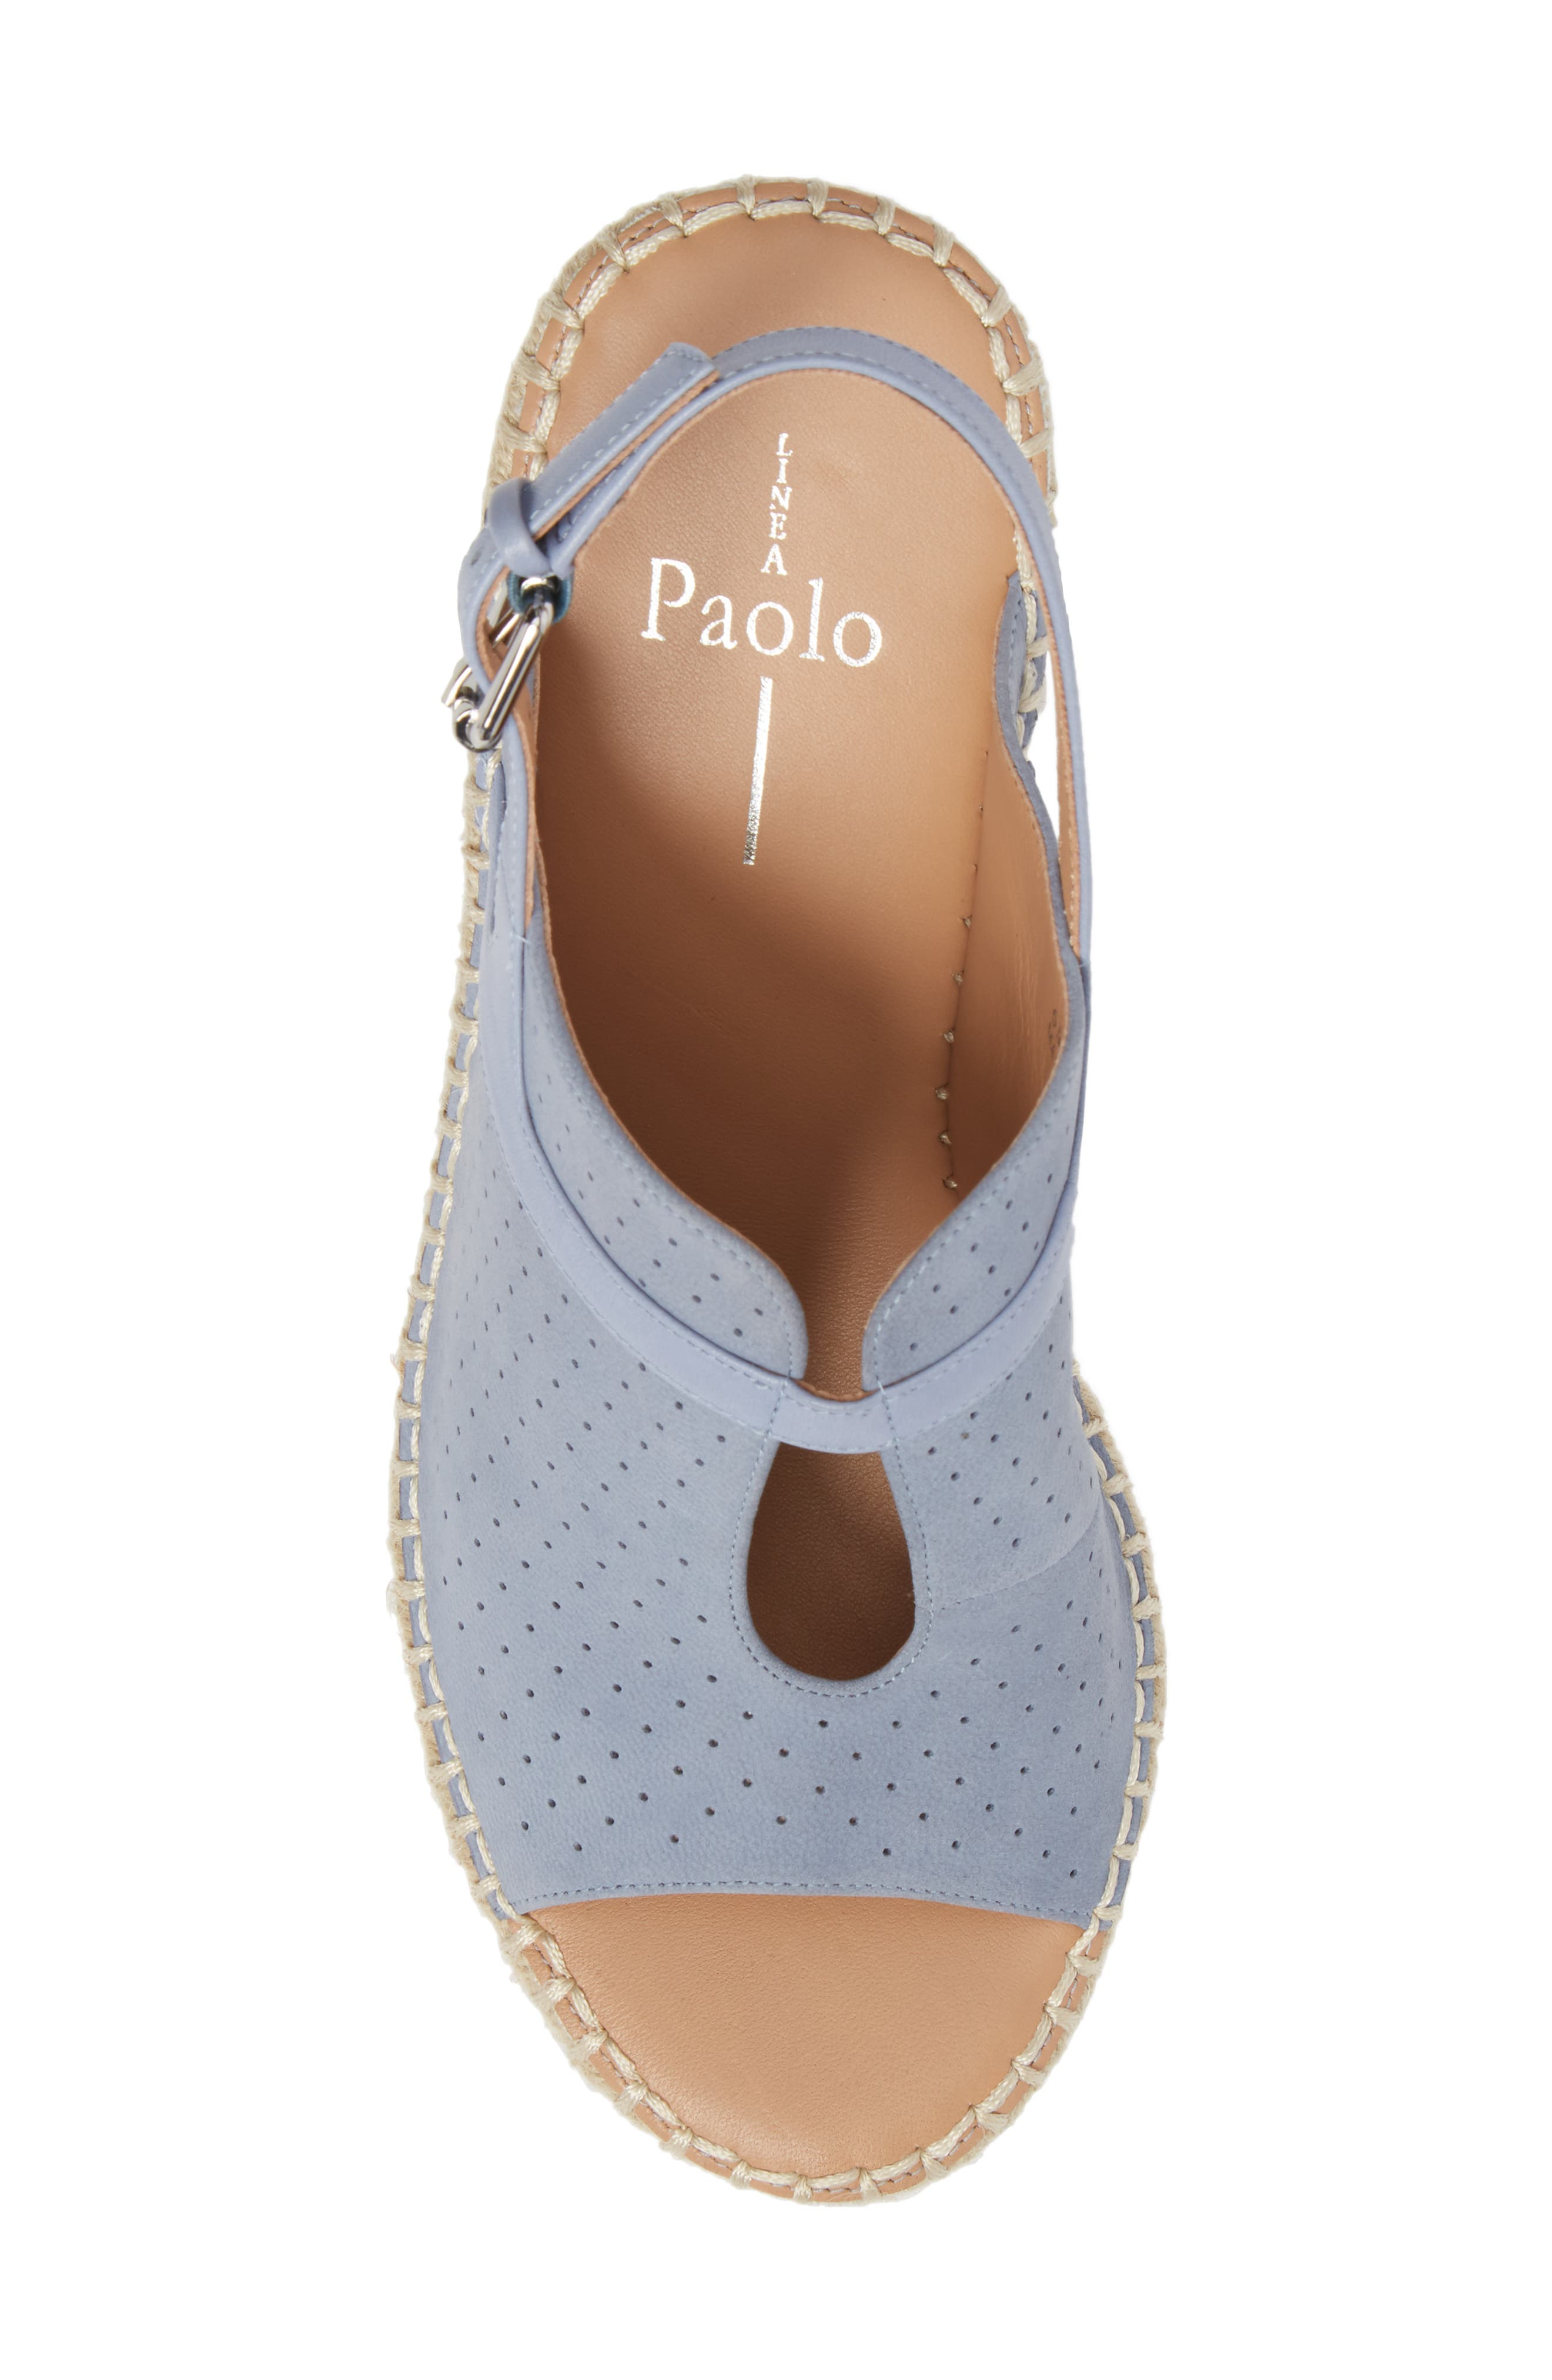 Everly Espadrille Wedge Sandal,                             Alternate thumbnail 6, color,                             Blue Nubuck Leather